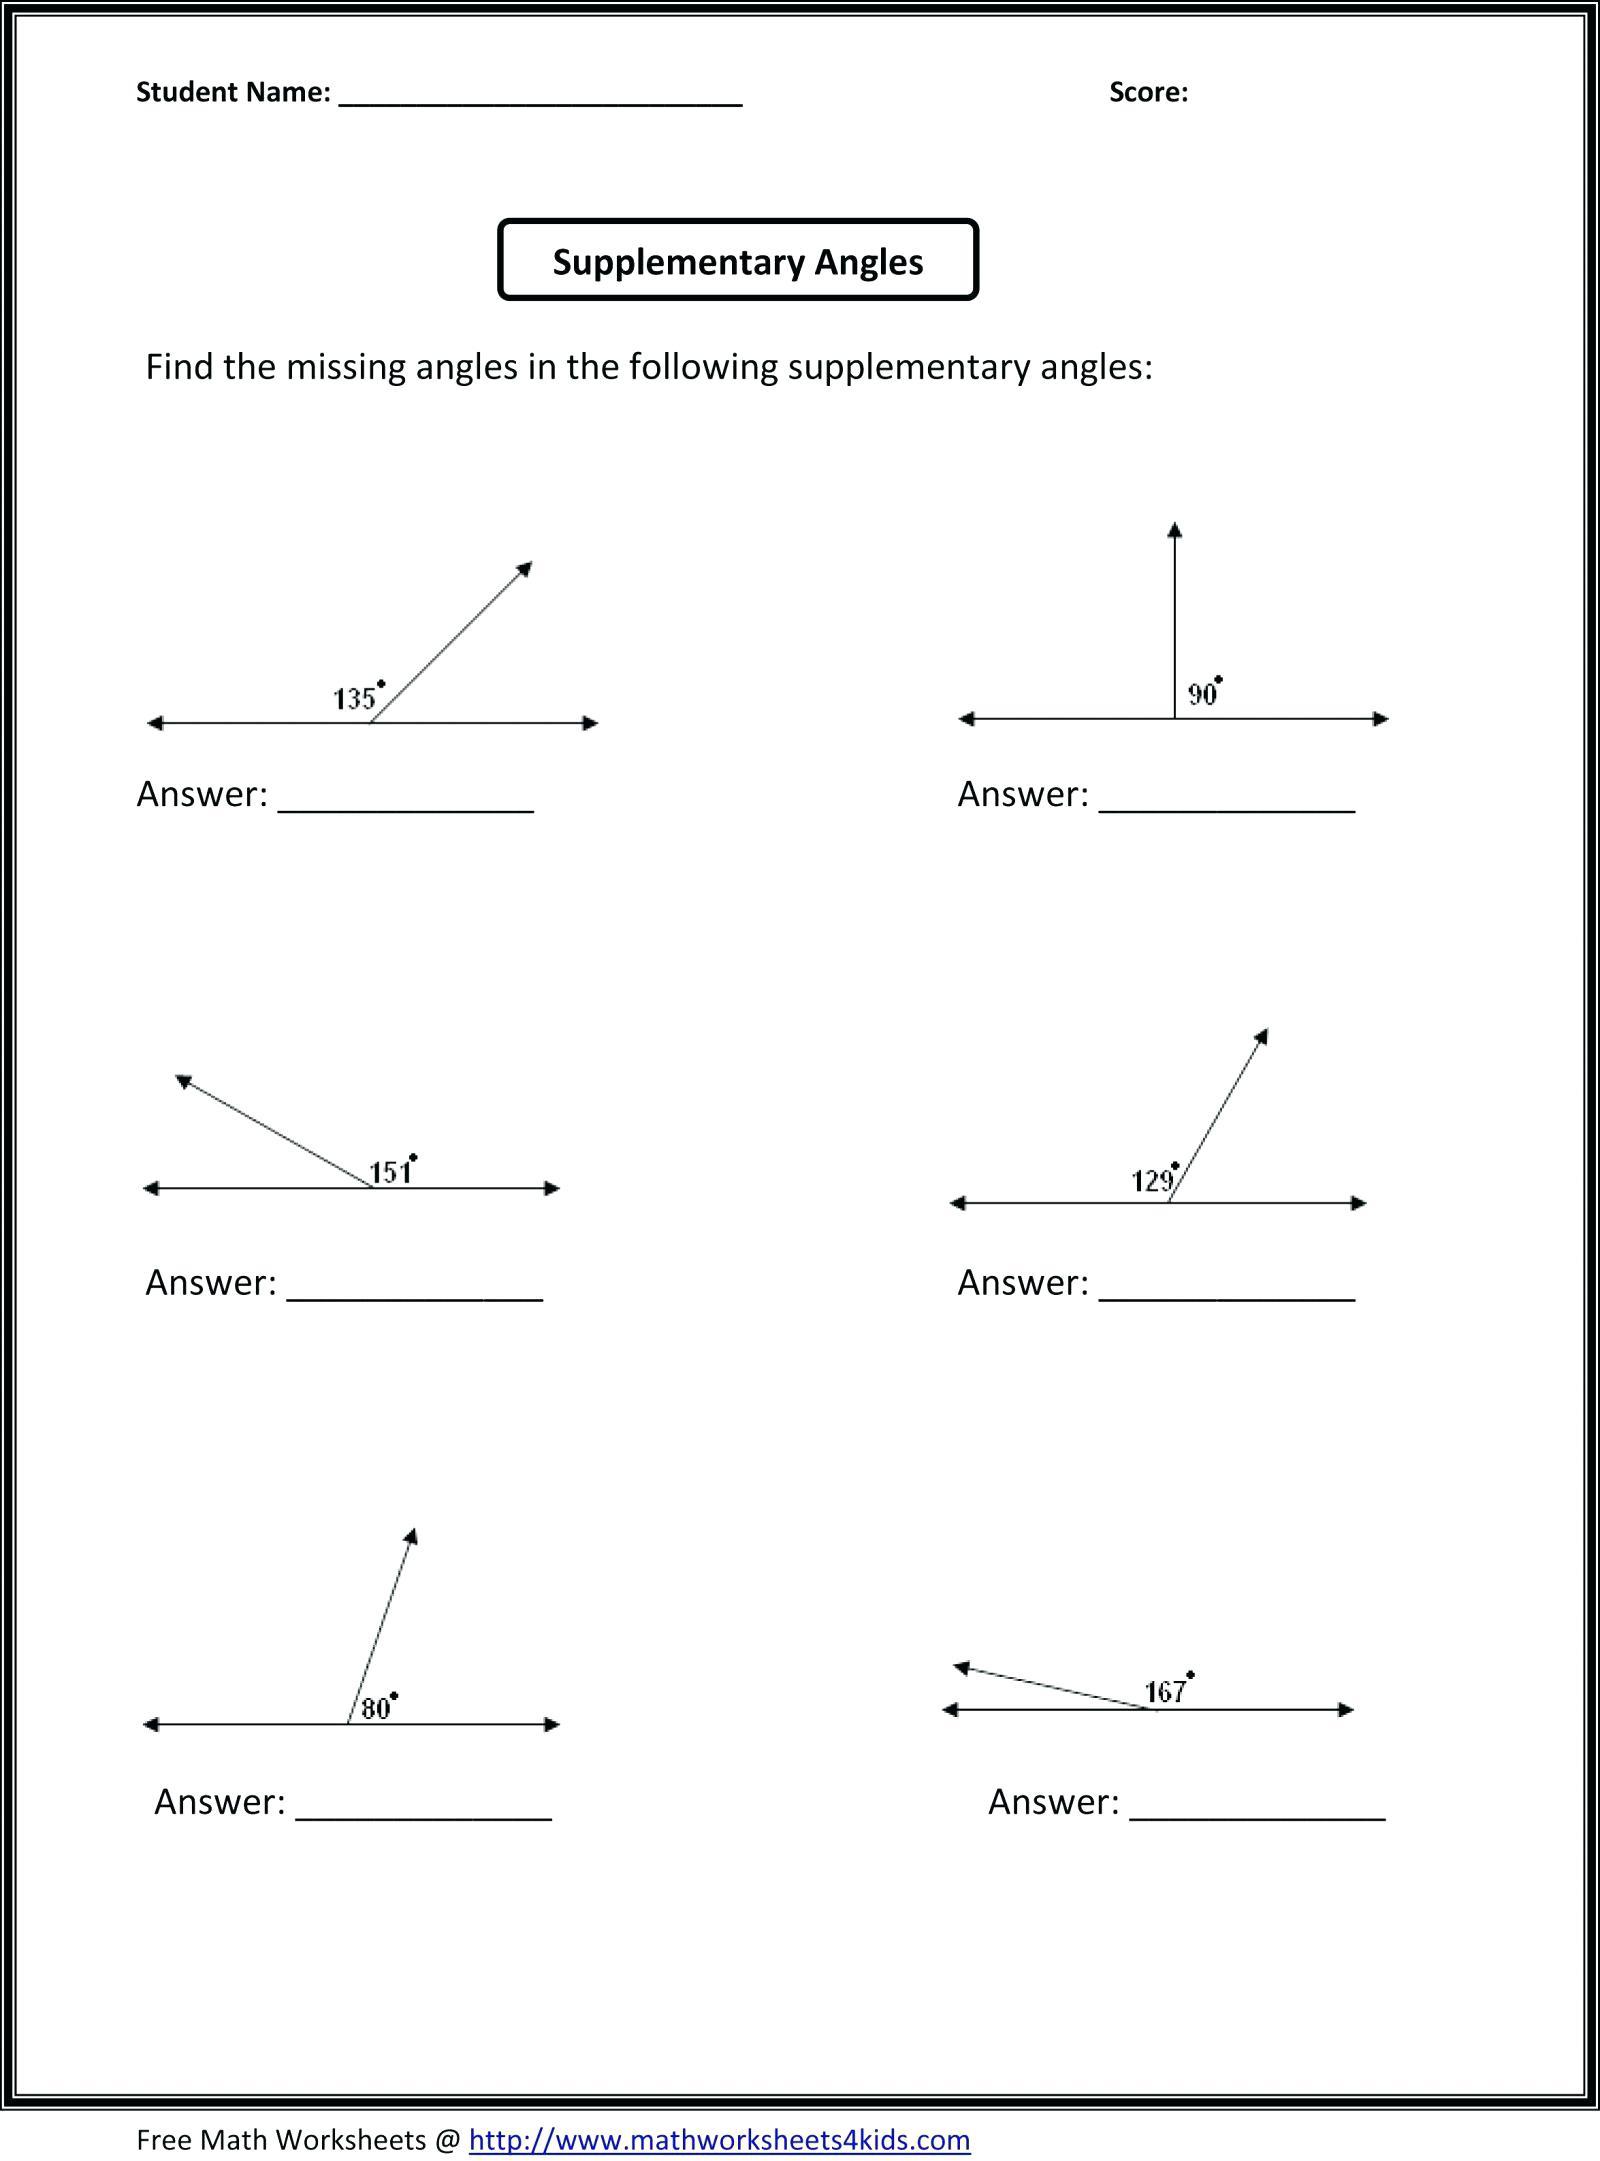 Math Worksheets For 6Th Graders Math Worksheets Grade Math - Free Printable Math Worksheets For 6Th Grade